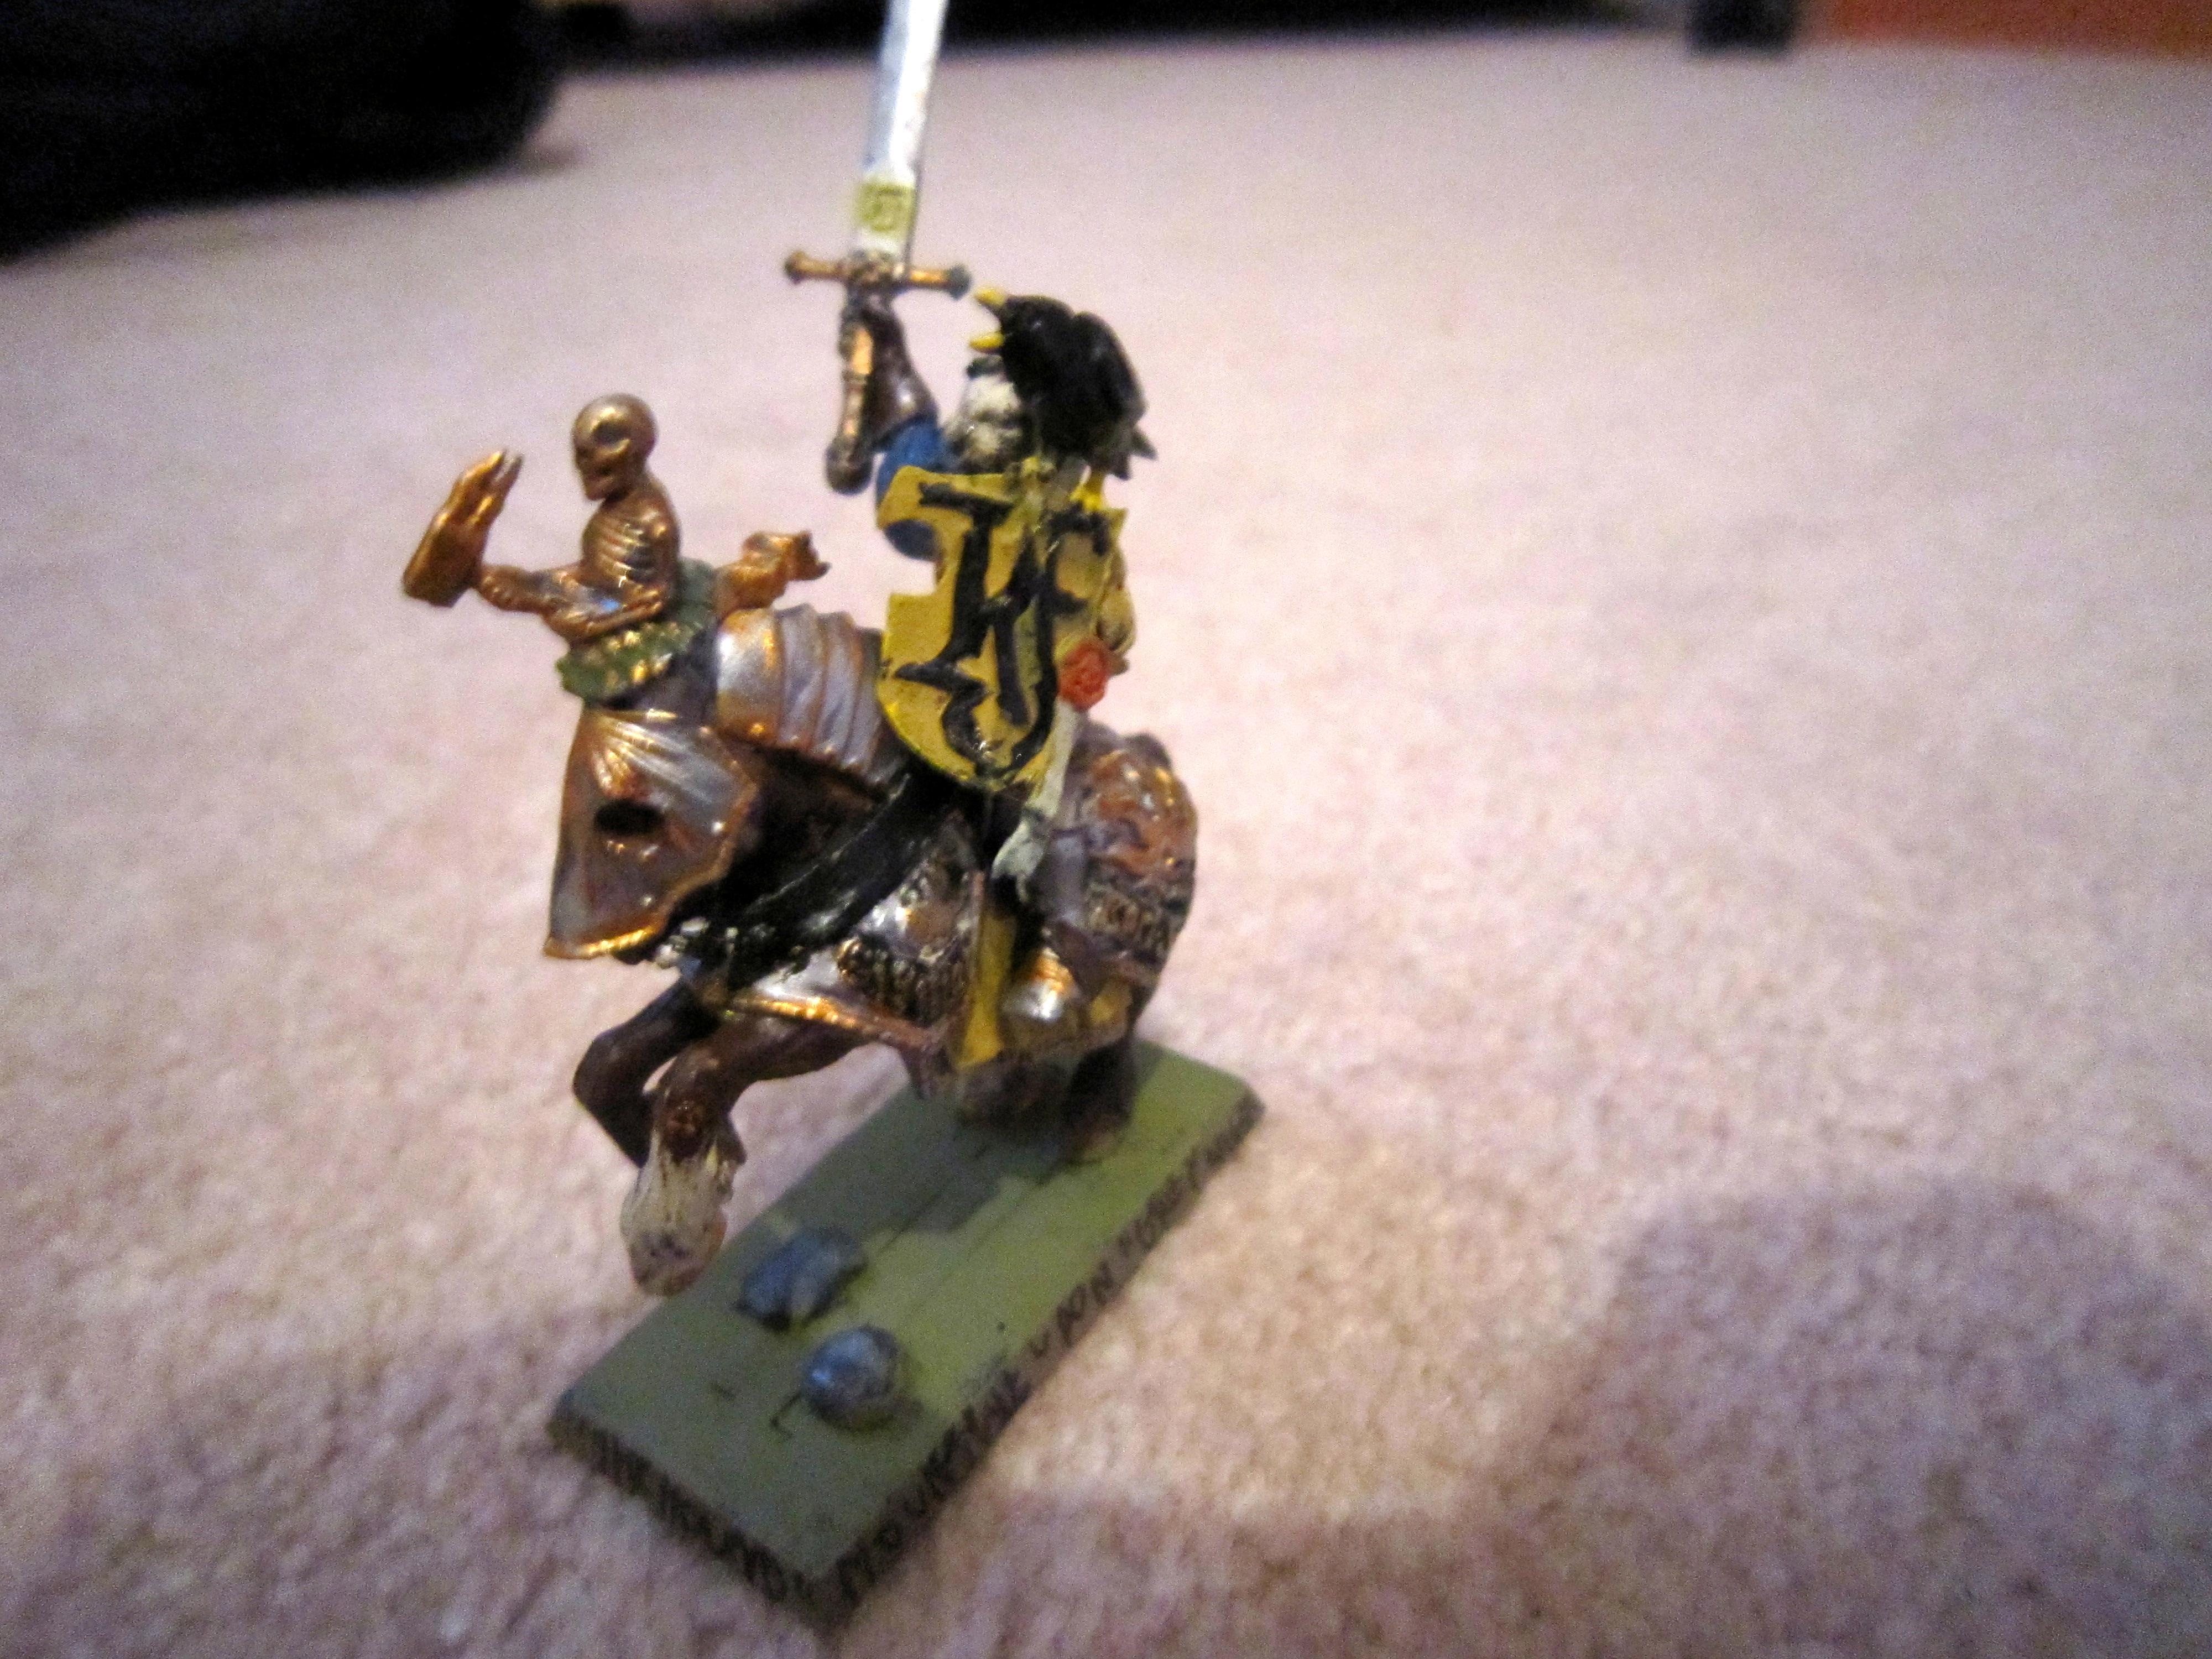 General Sandor of Nordland